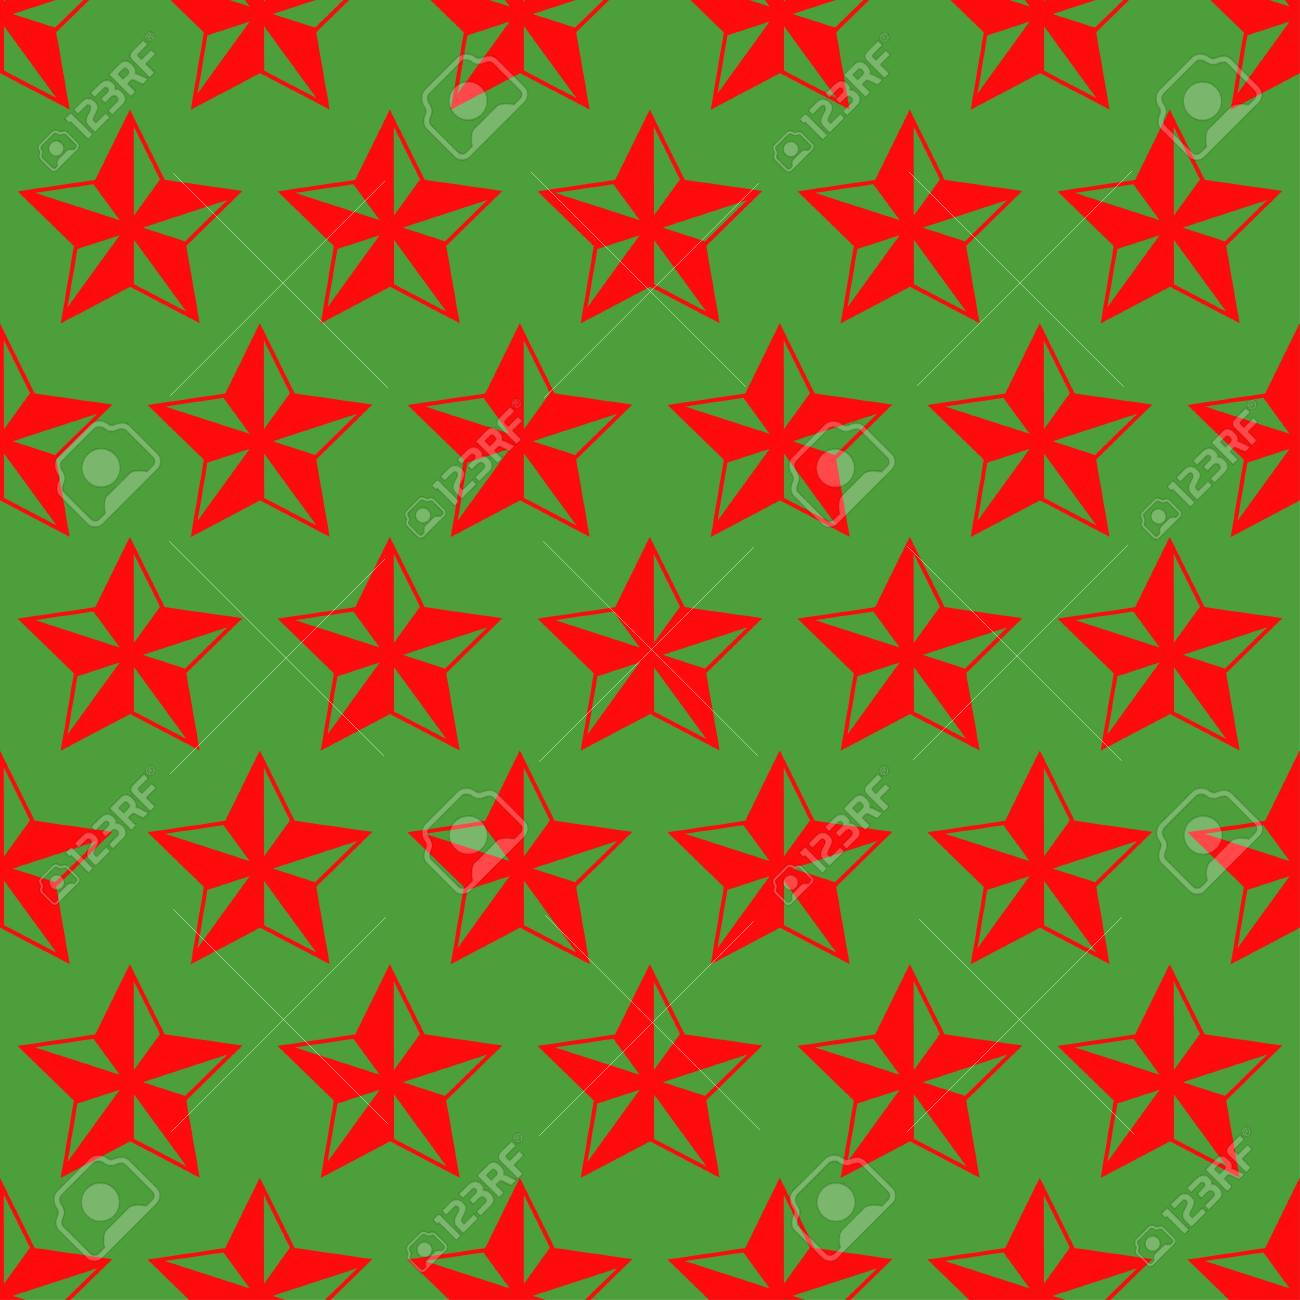 Stars Christmas pattern - 114708561